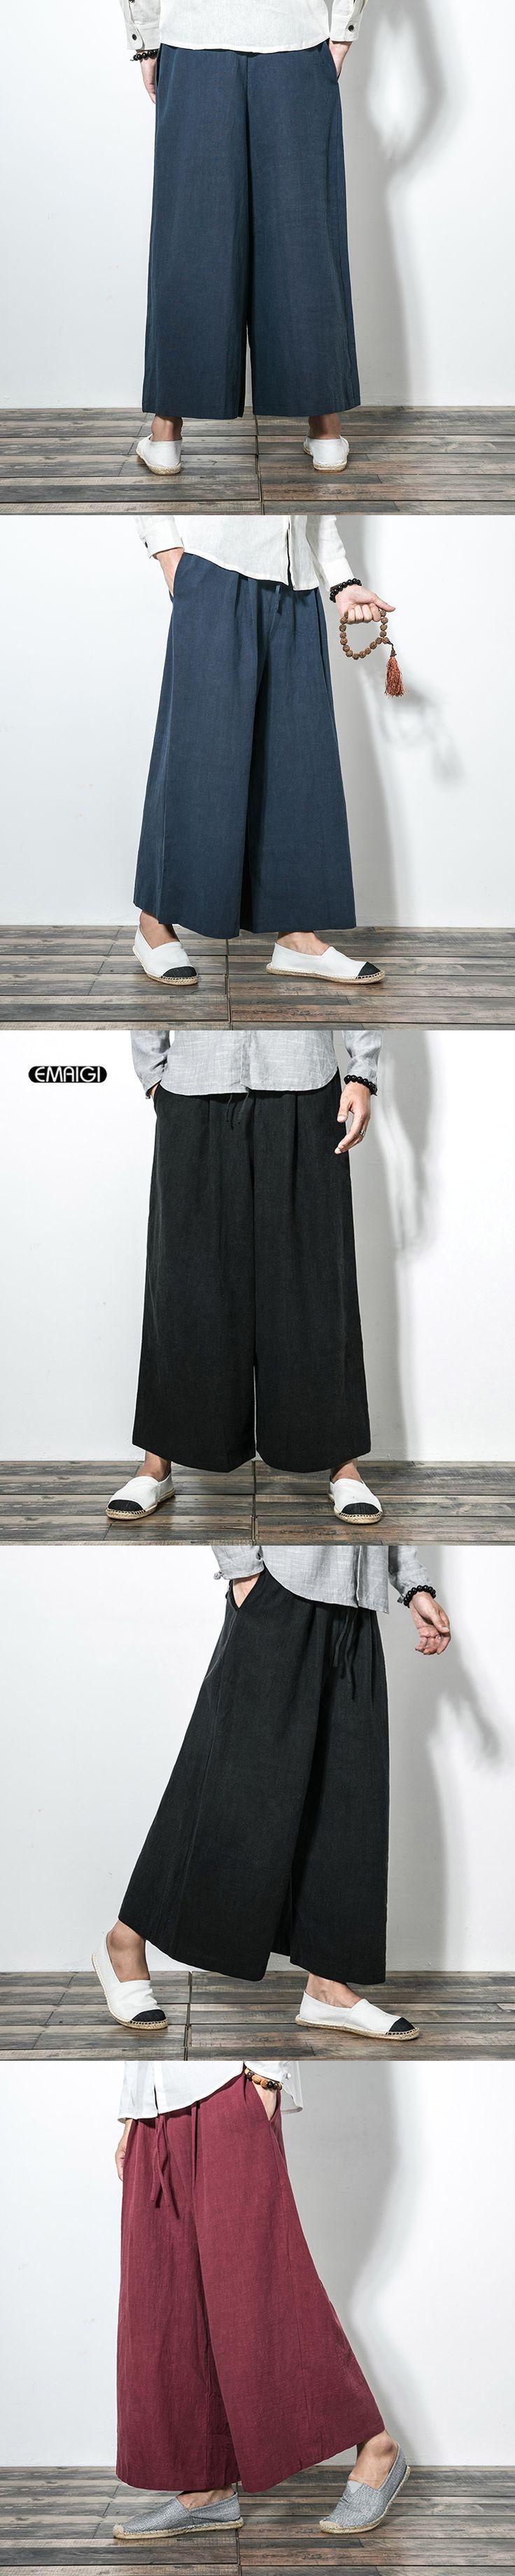 Cotton Linen Casual Pant for Men Wide Leg Pants Japan Style Kimono Punk Style Male Women Fashion Loose Trousers Skirt Pant